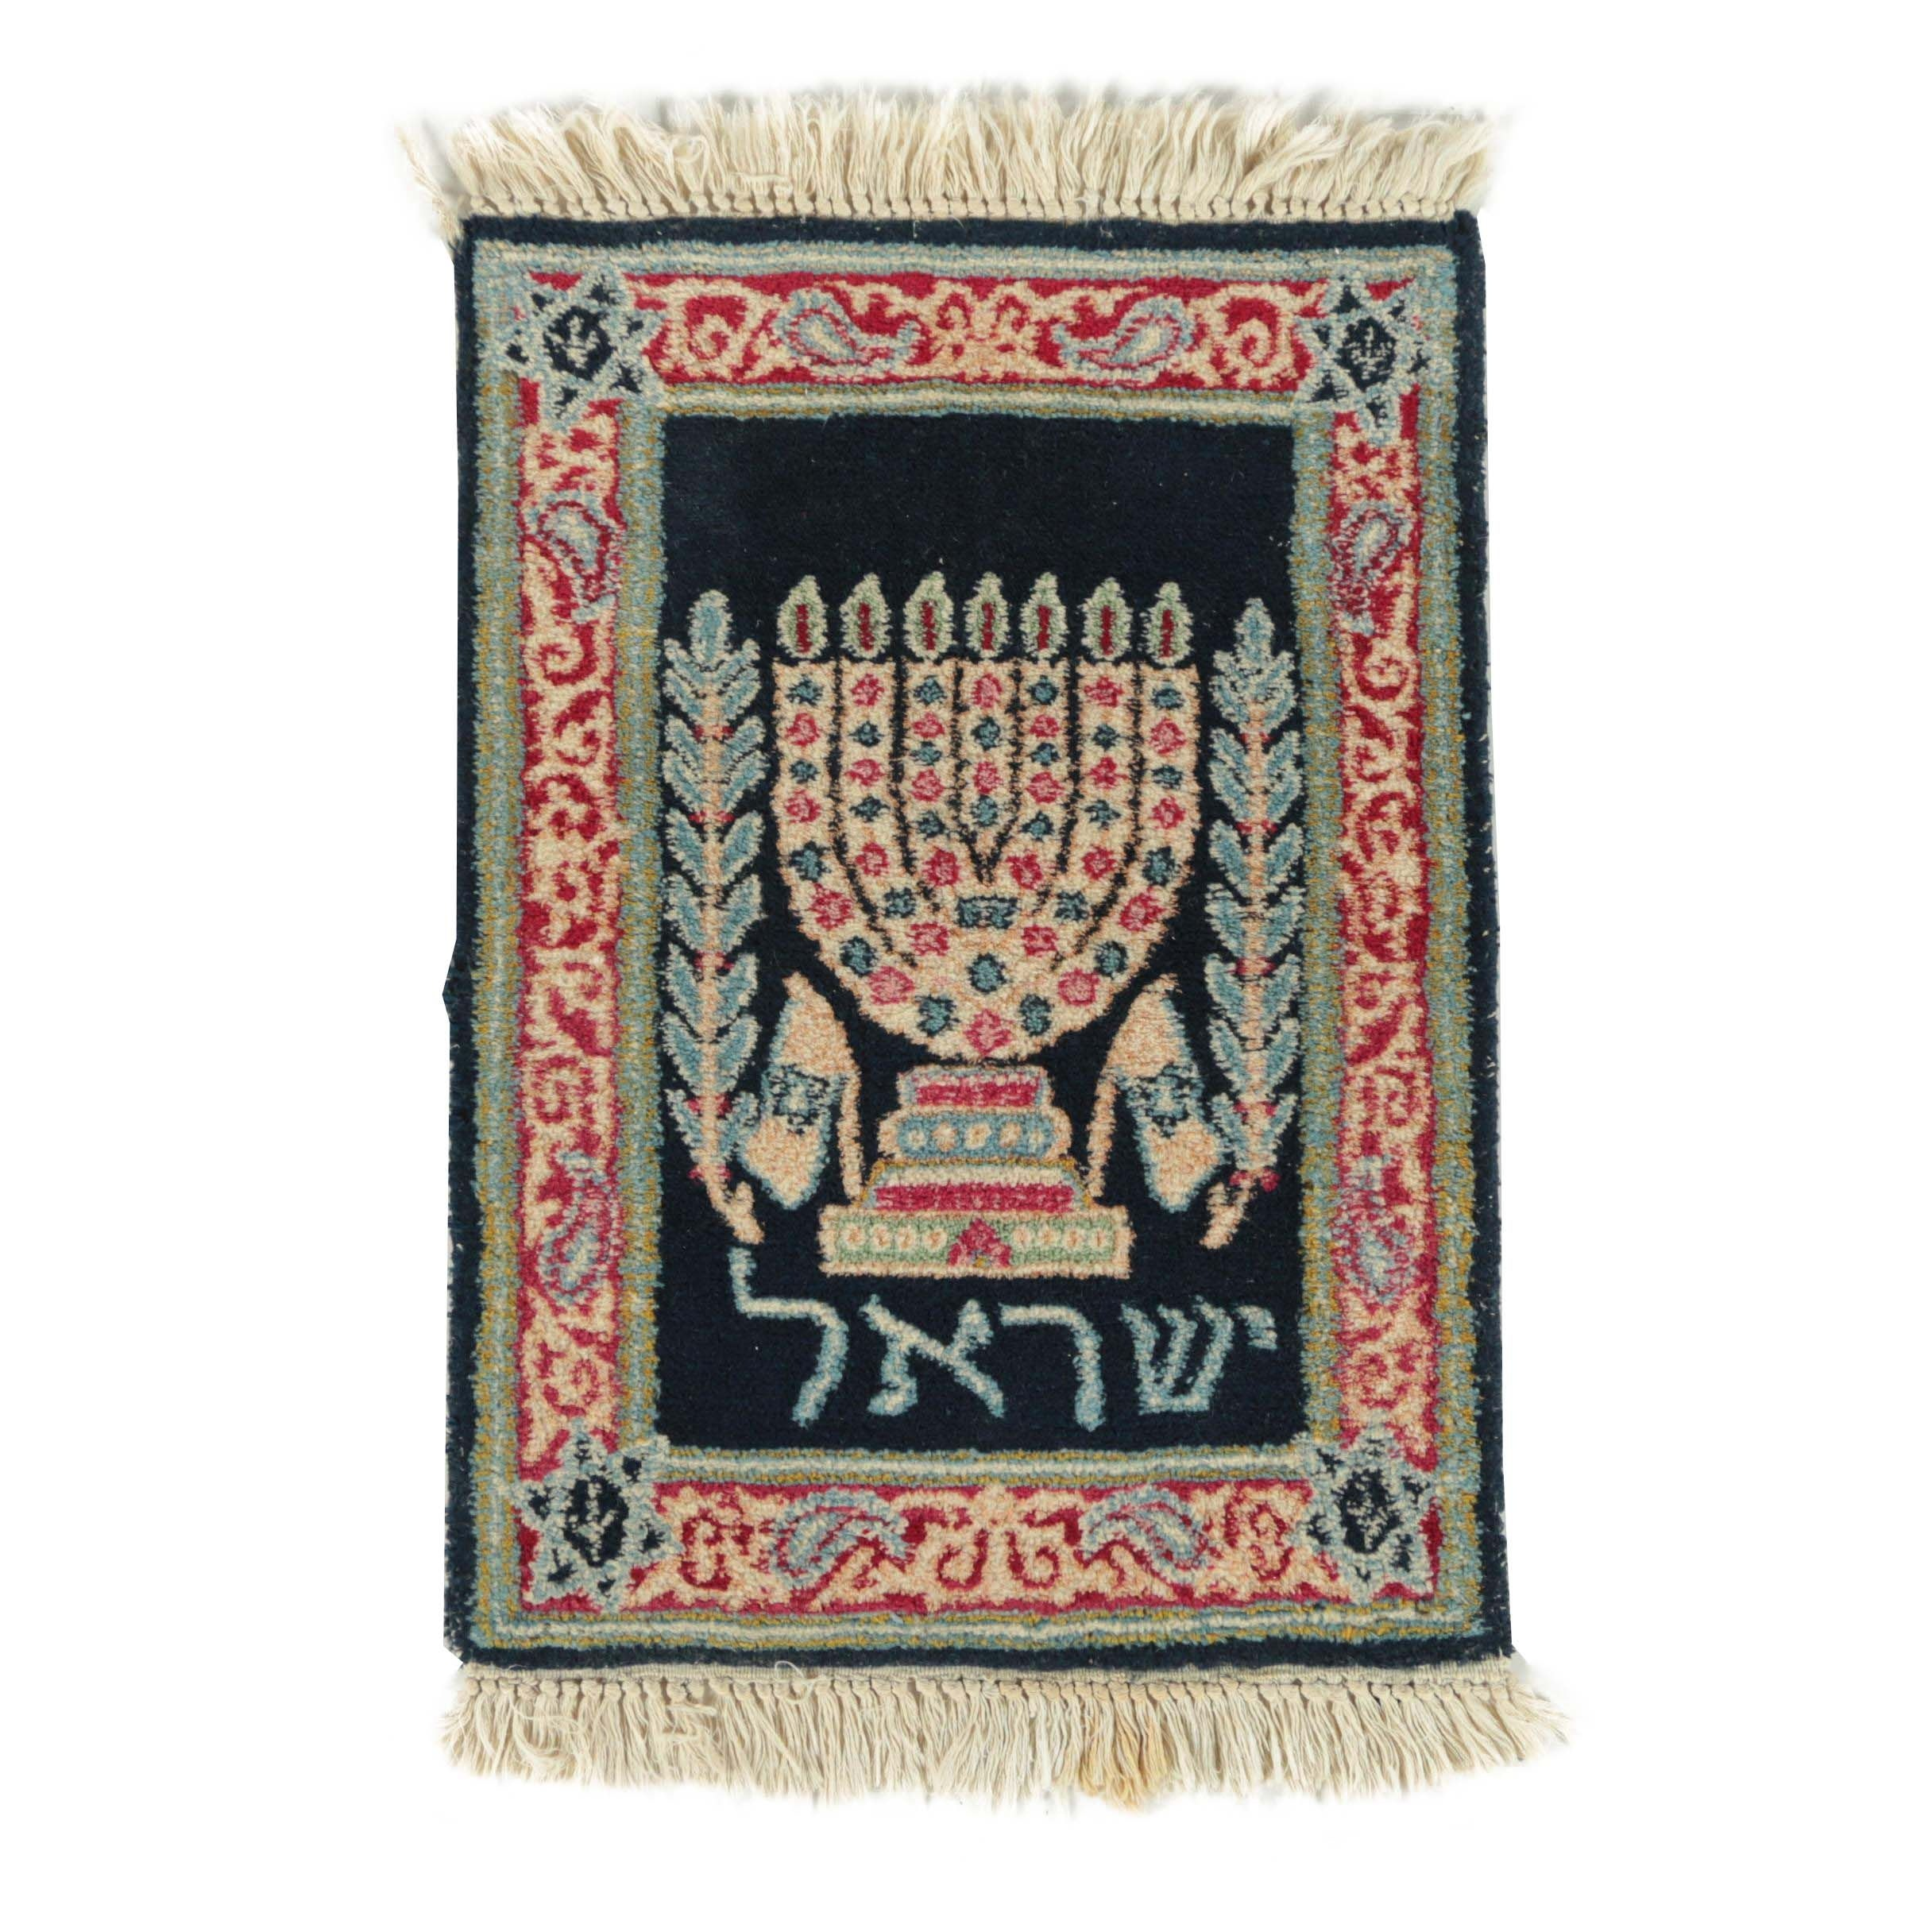 Hand-Knotted Persian Hebrew Wool Prayer Mat, Circa 1950s